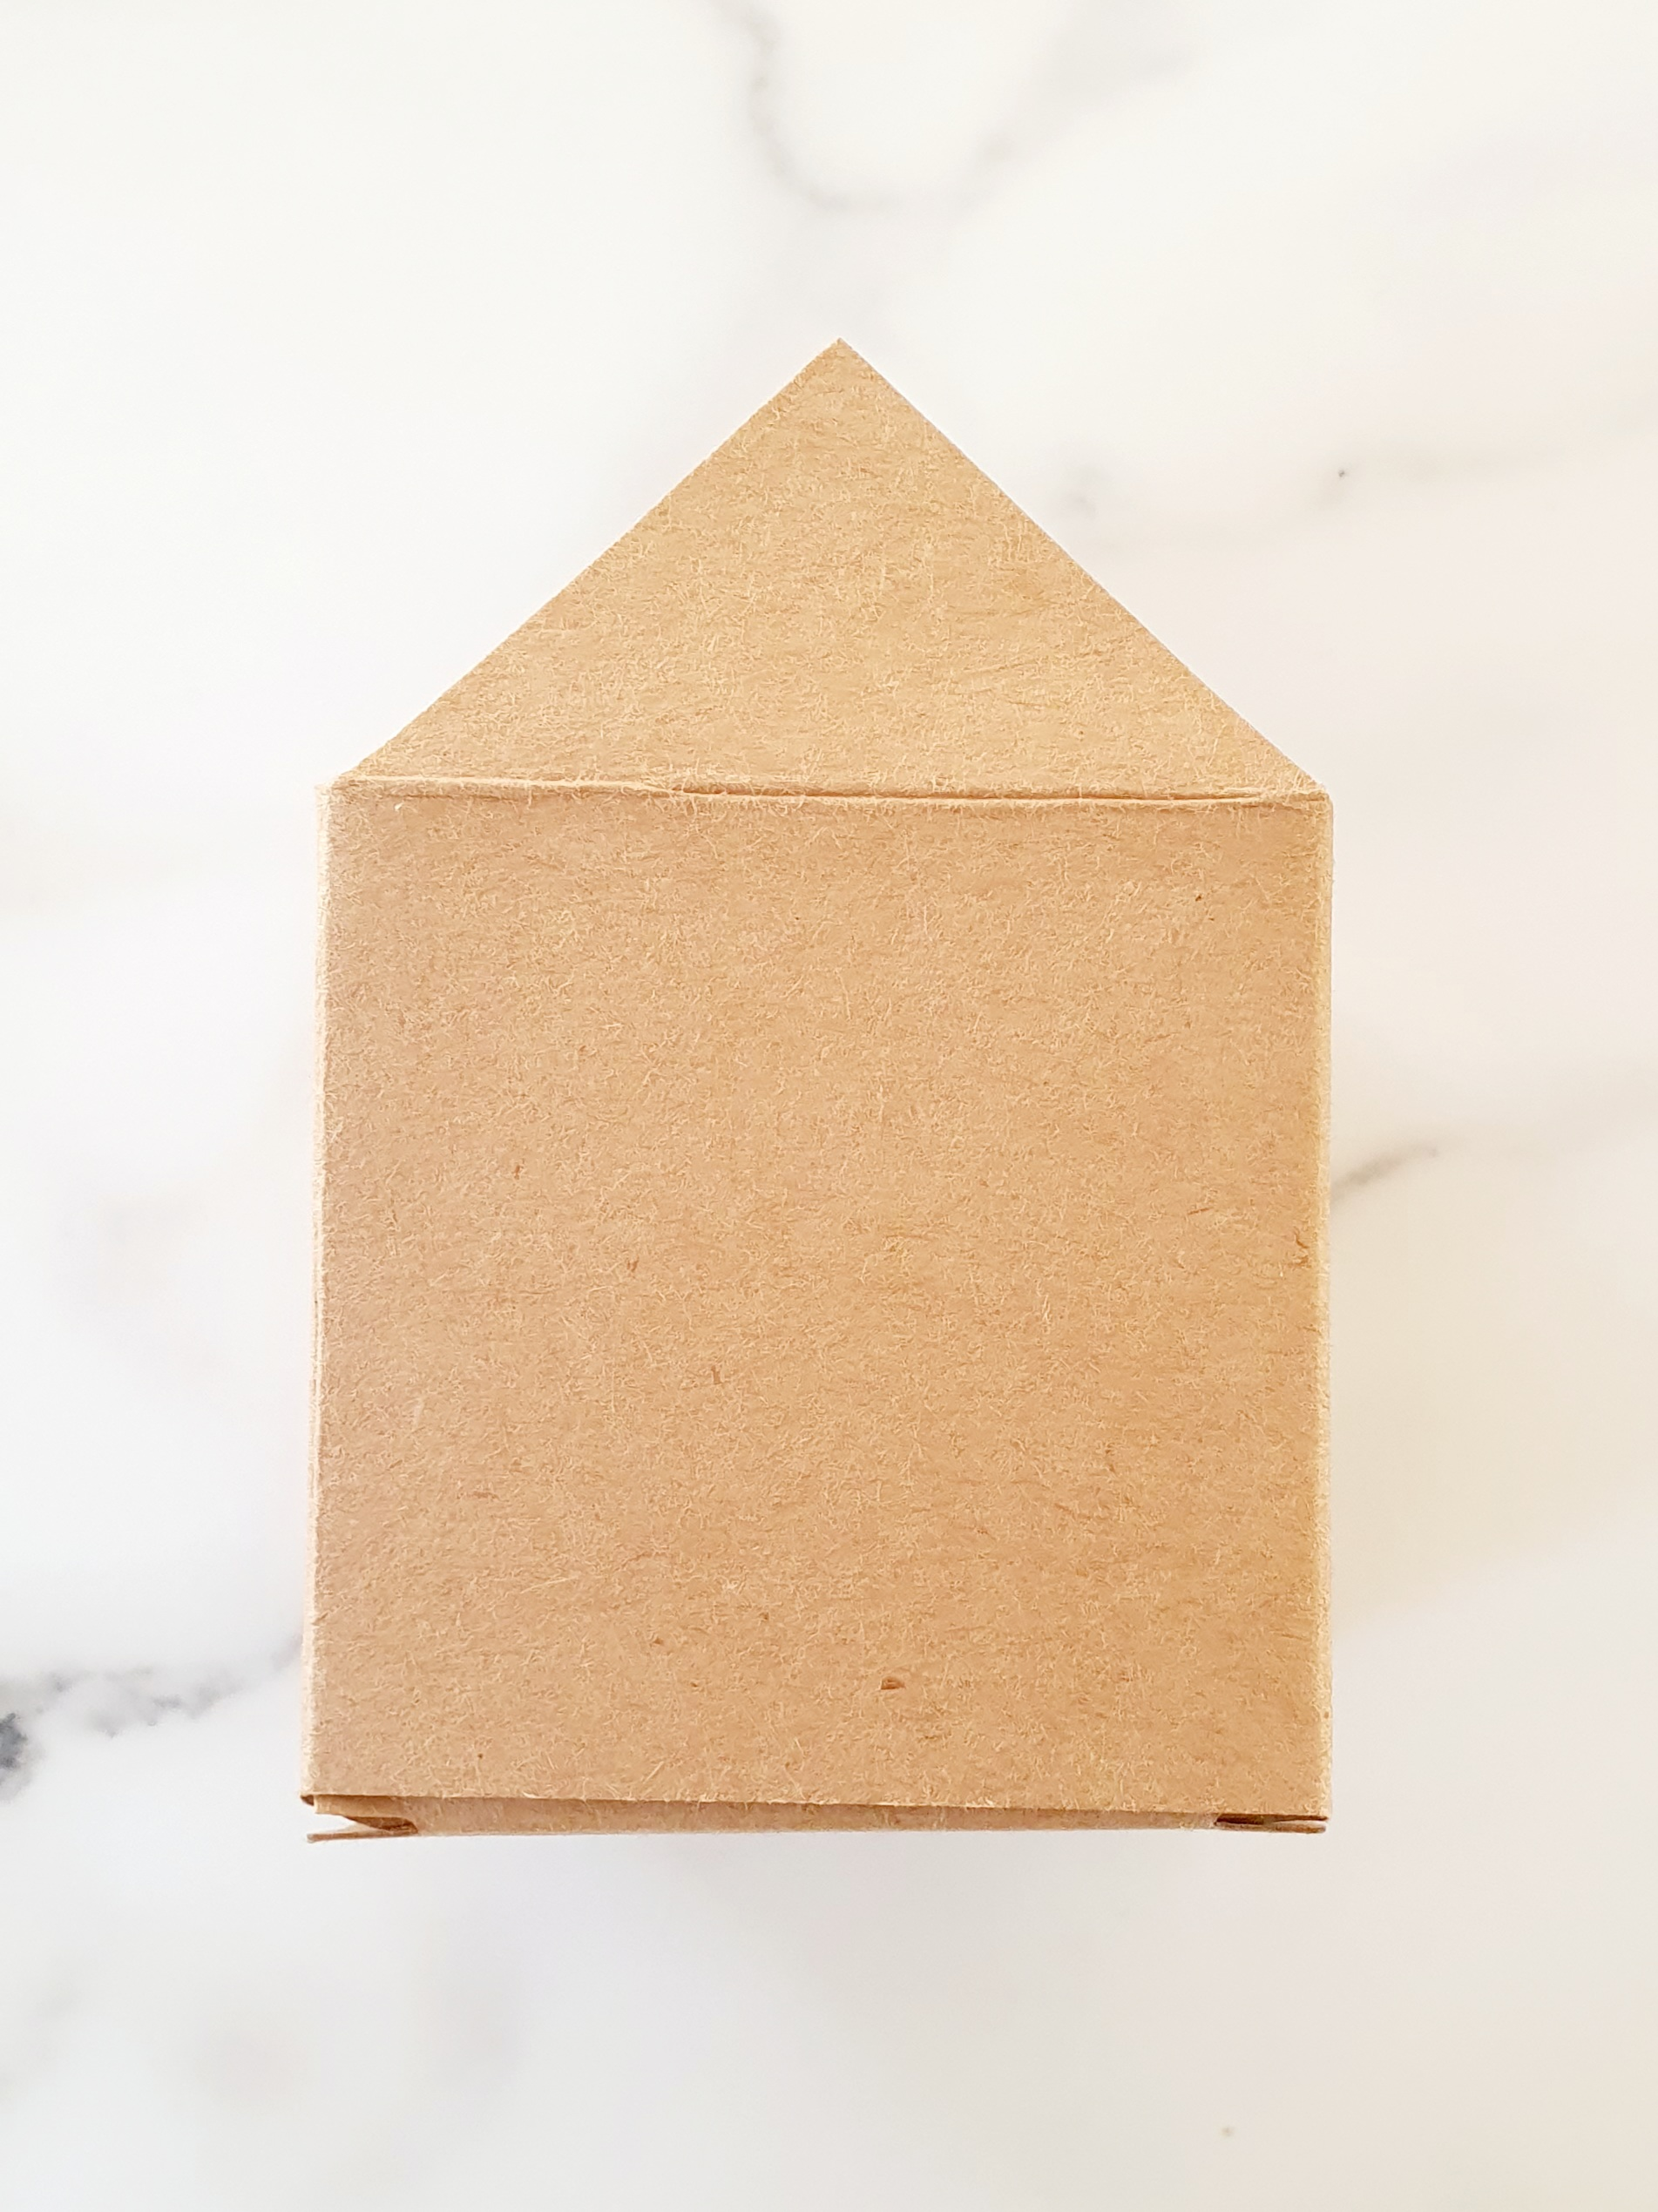 Birdhouse Treasure Box | A Few Small Adventures